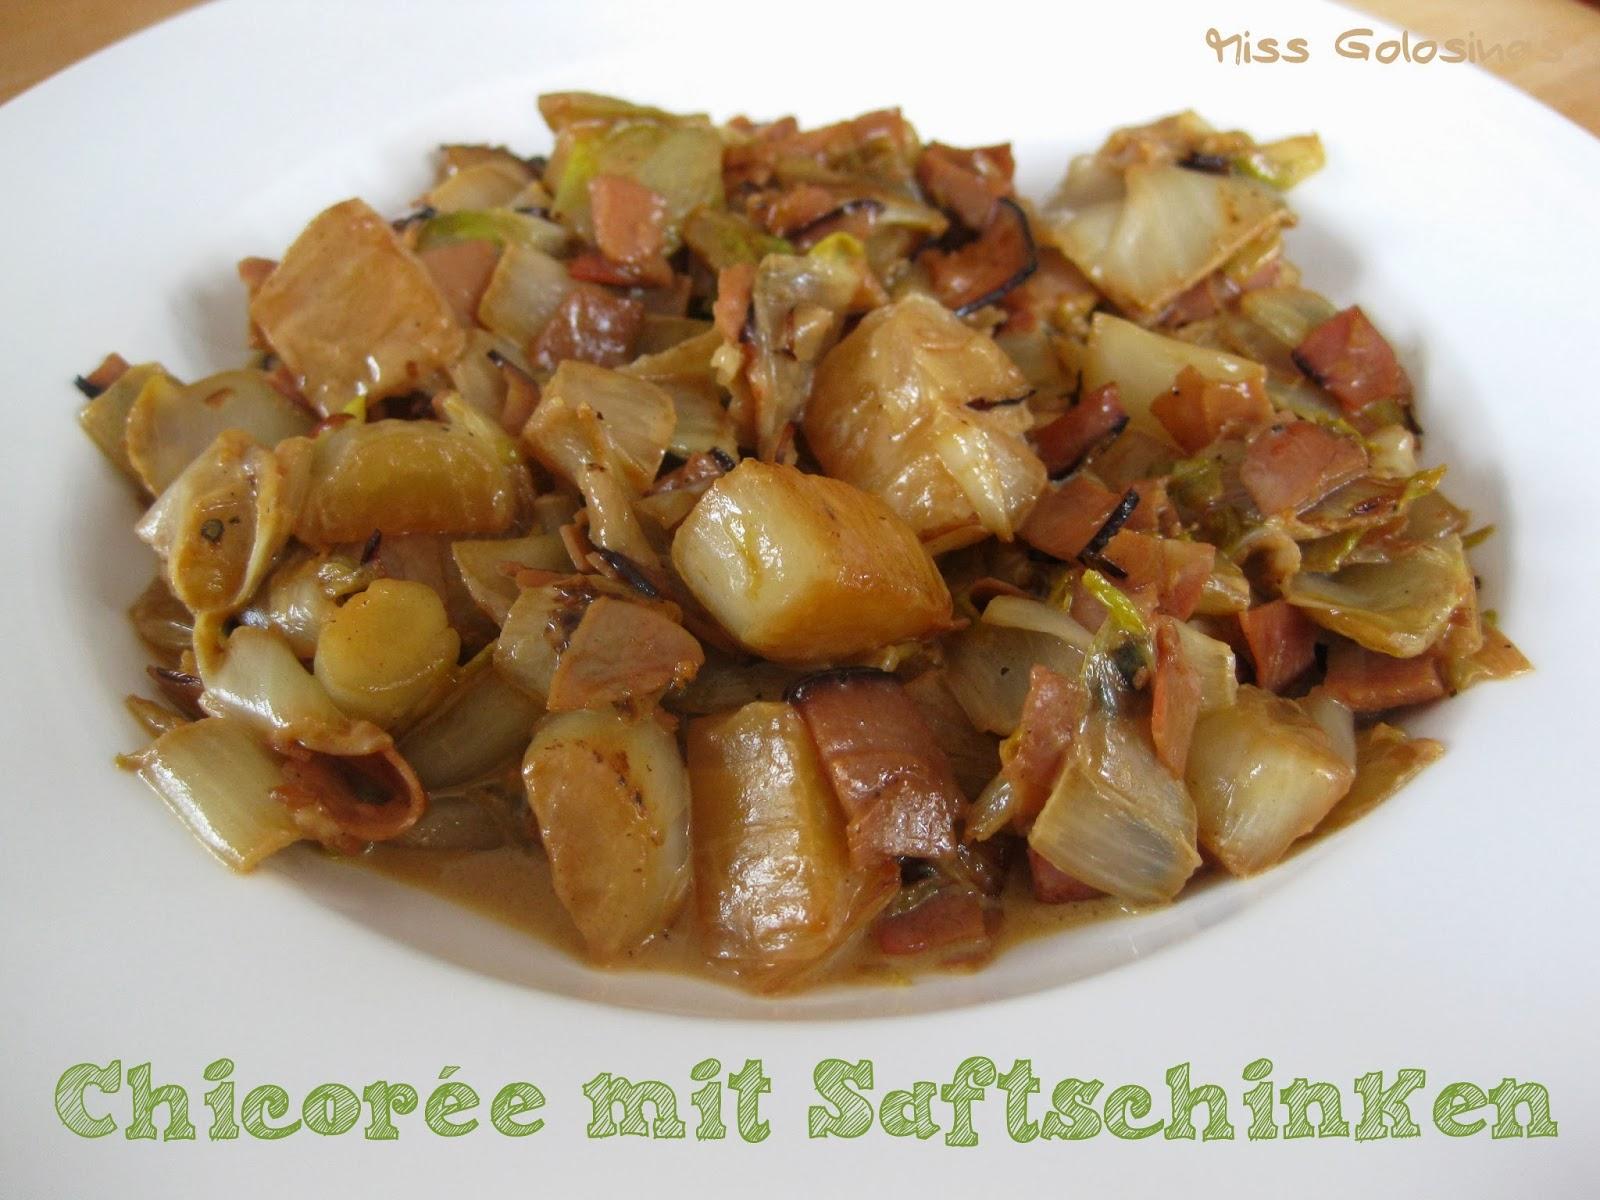 Chicorée, Endivias, Wintergemüse, Saftschinken, anbraten, bitter